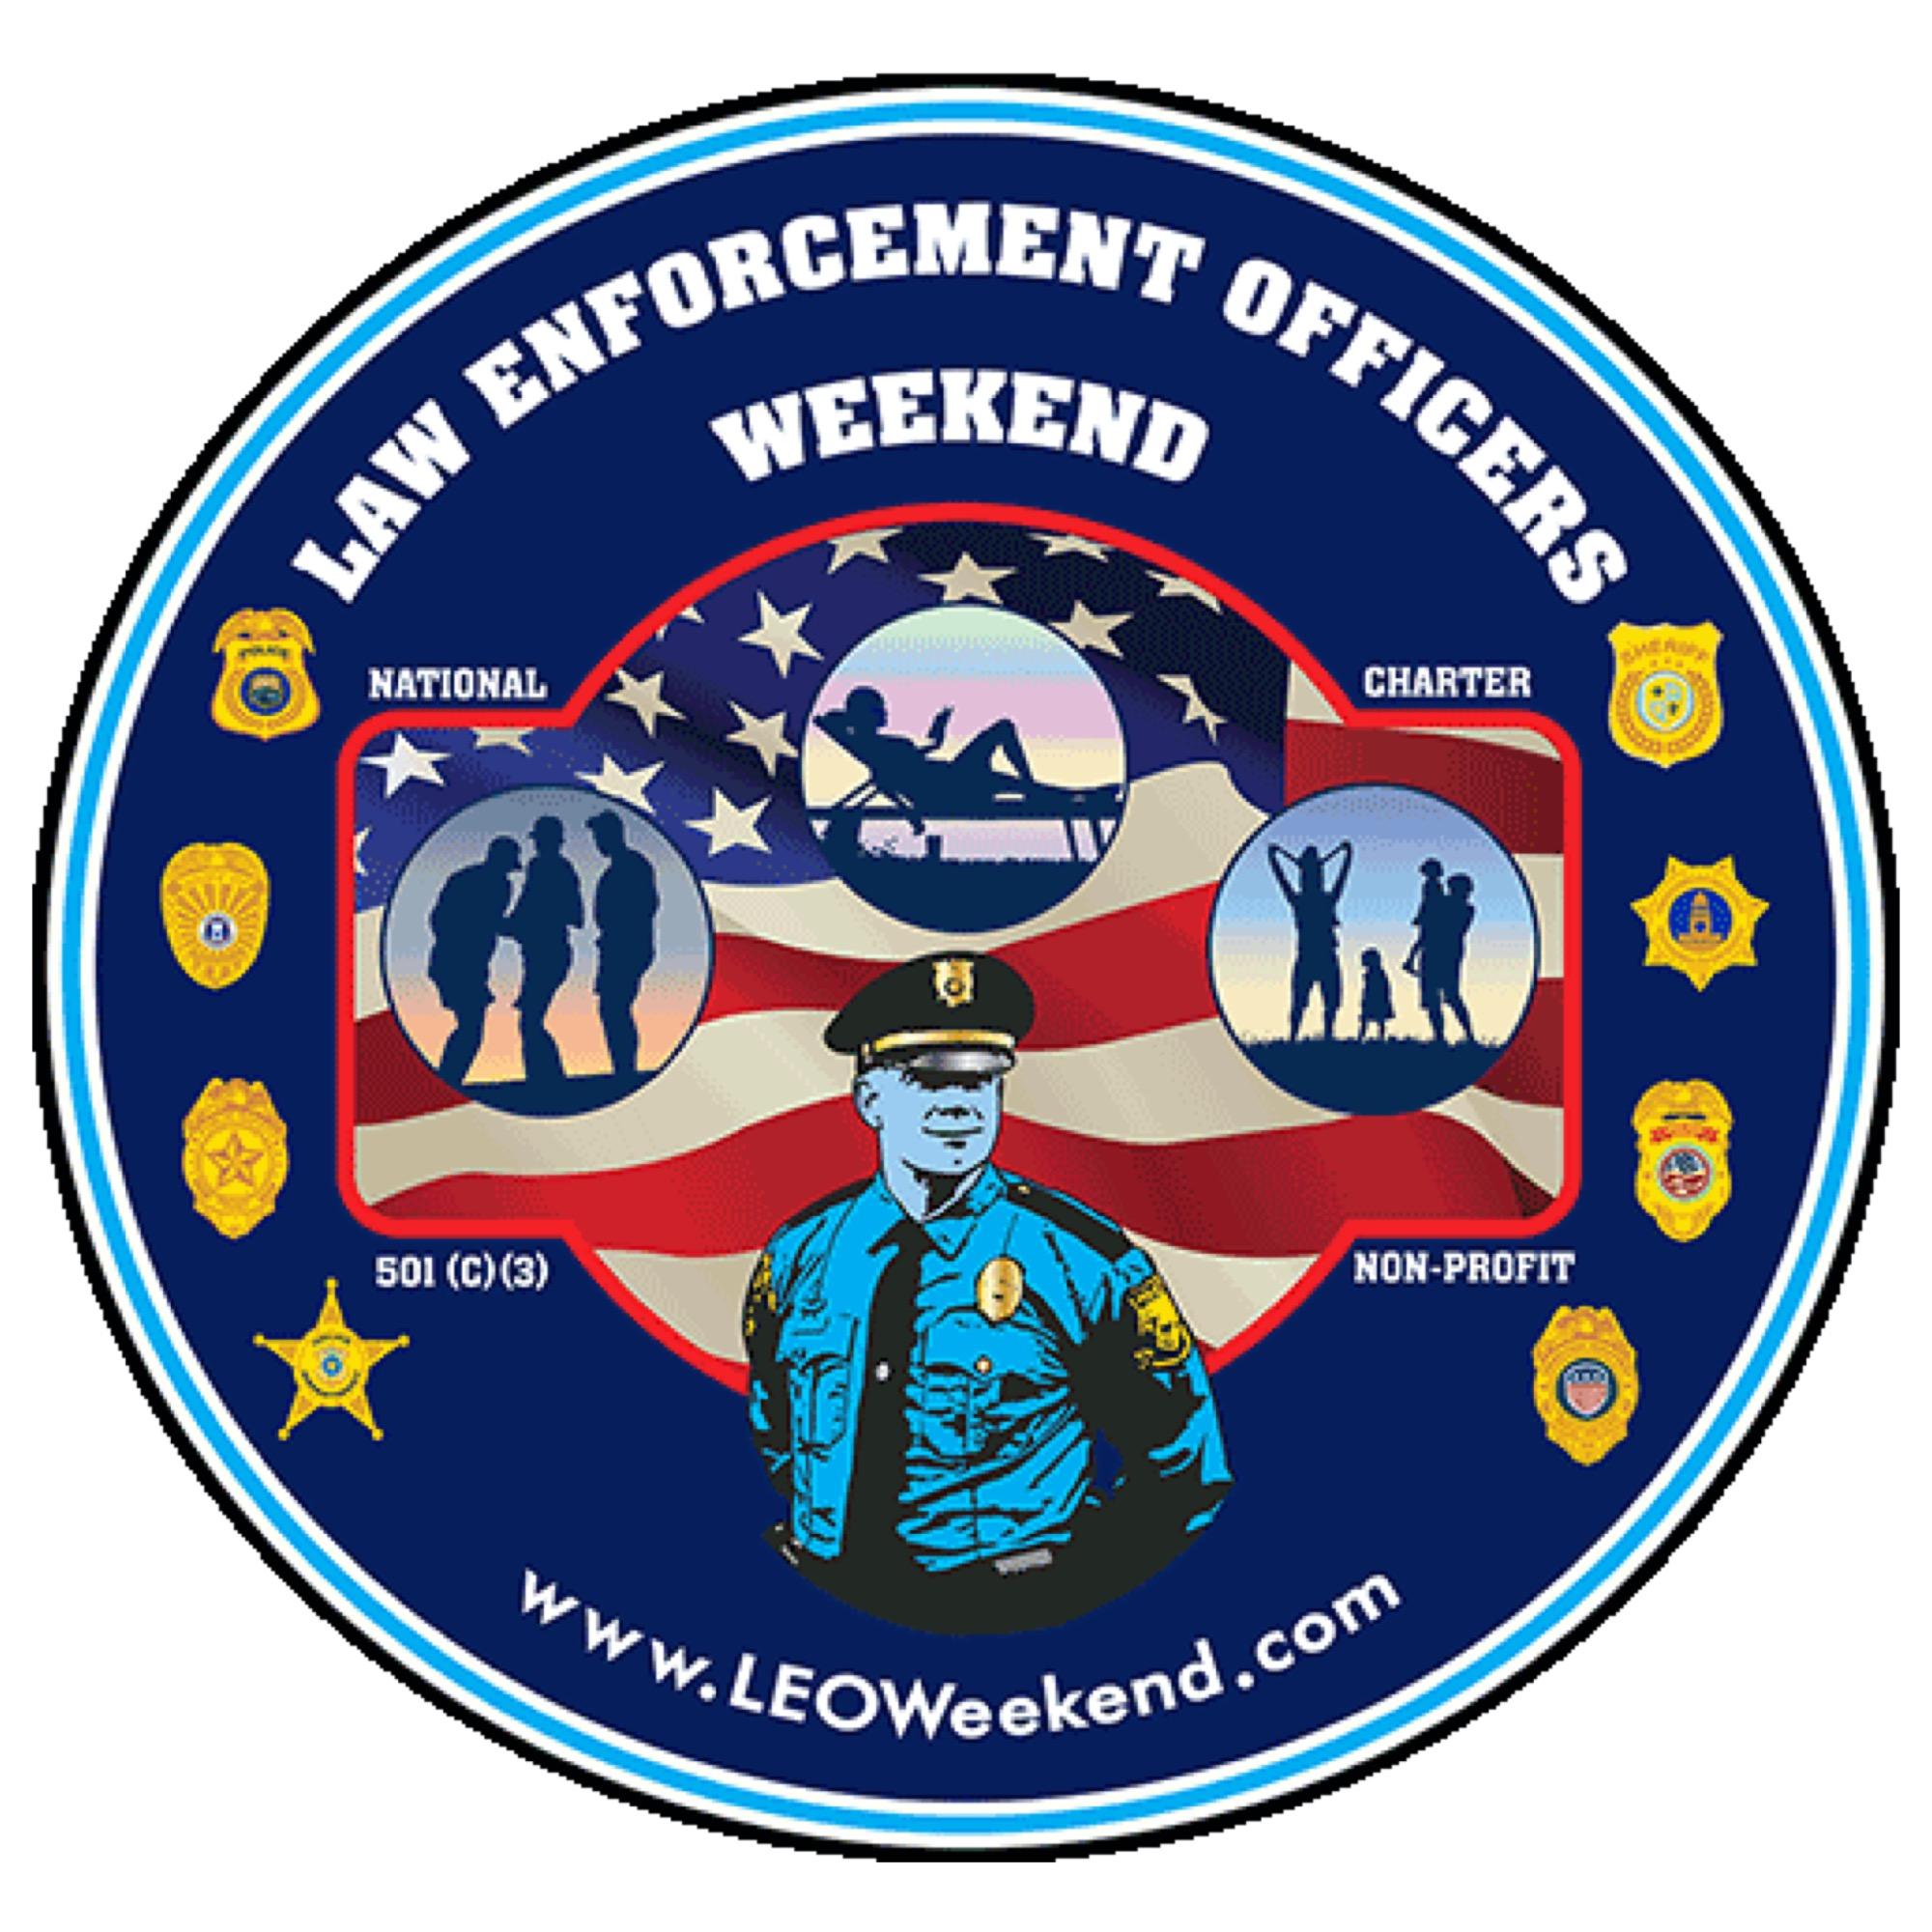 Law Enforcement Officers Weekend